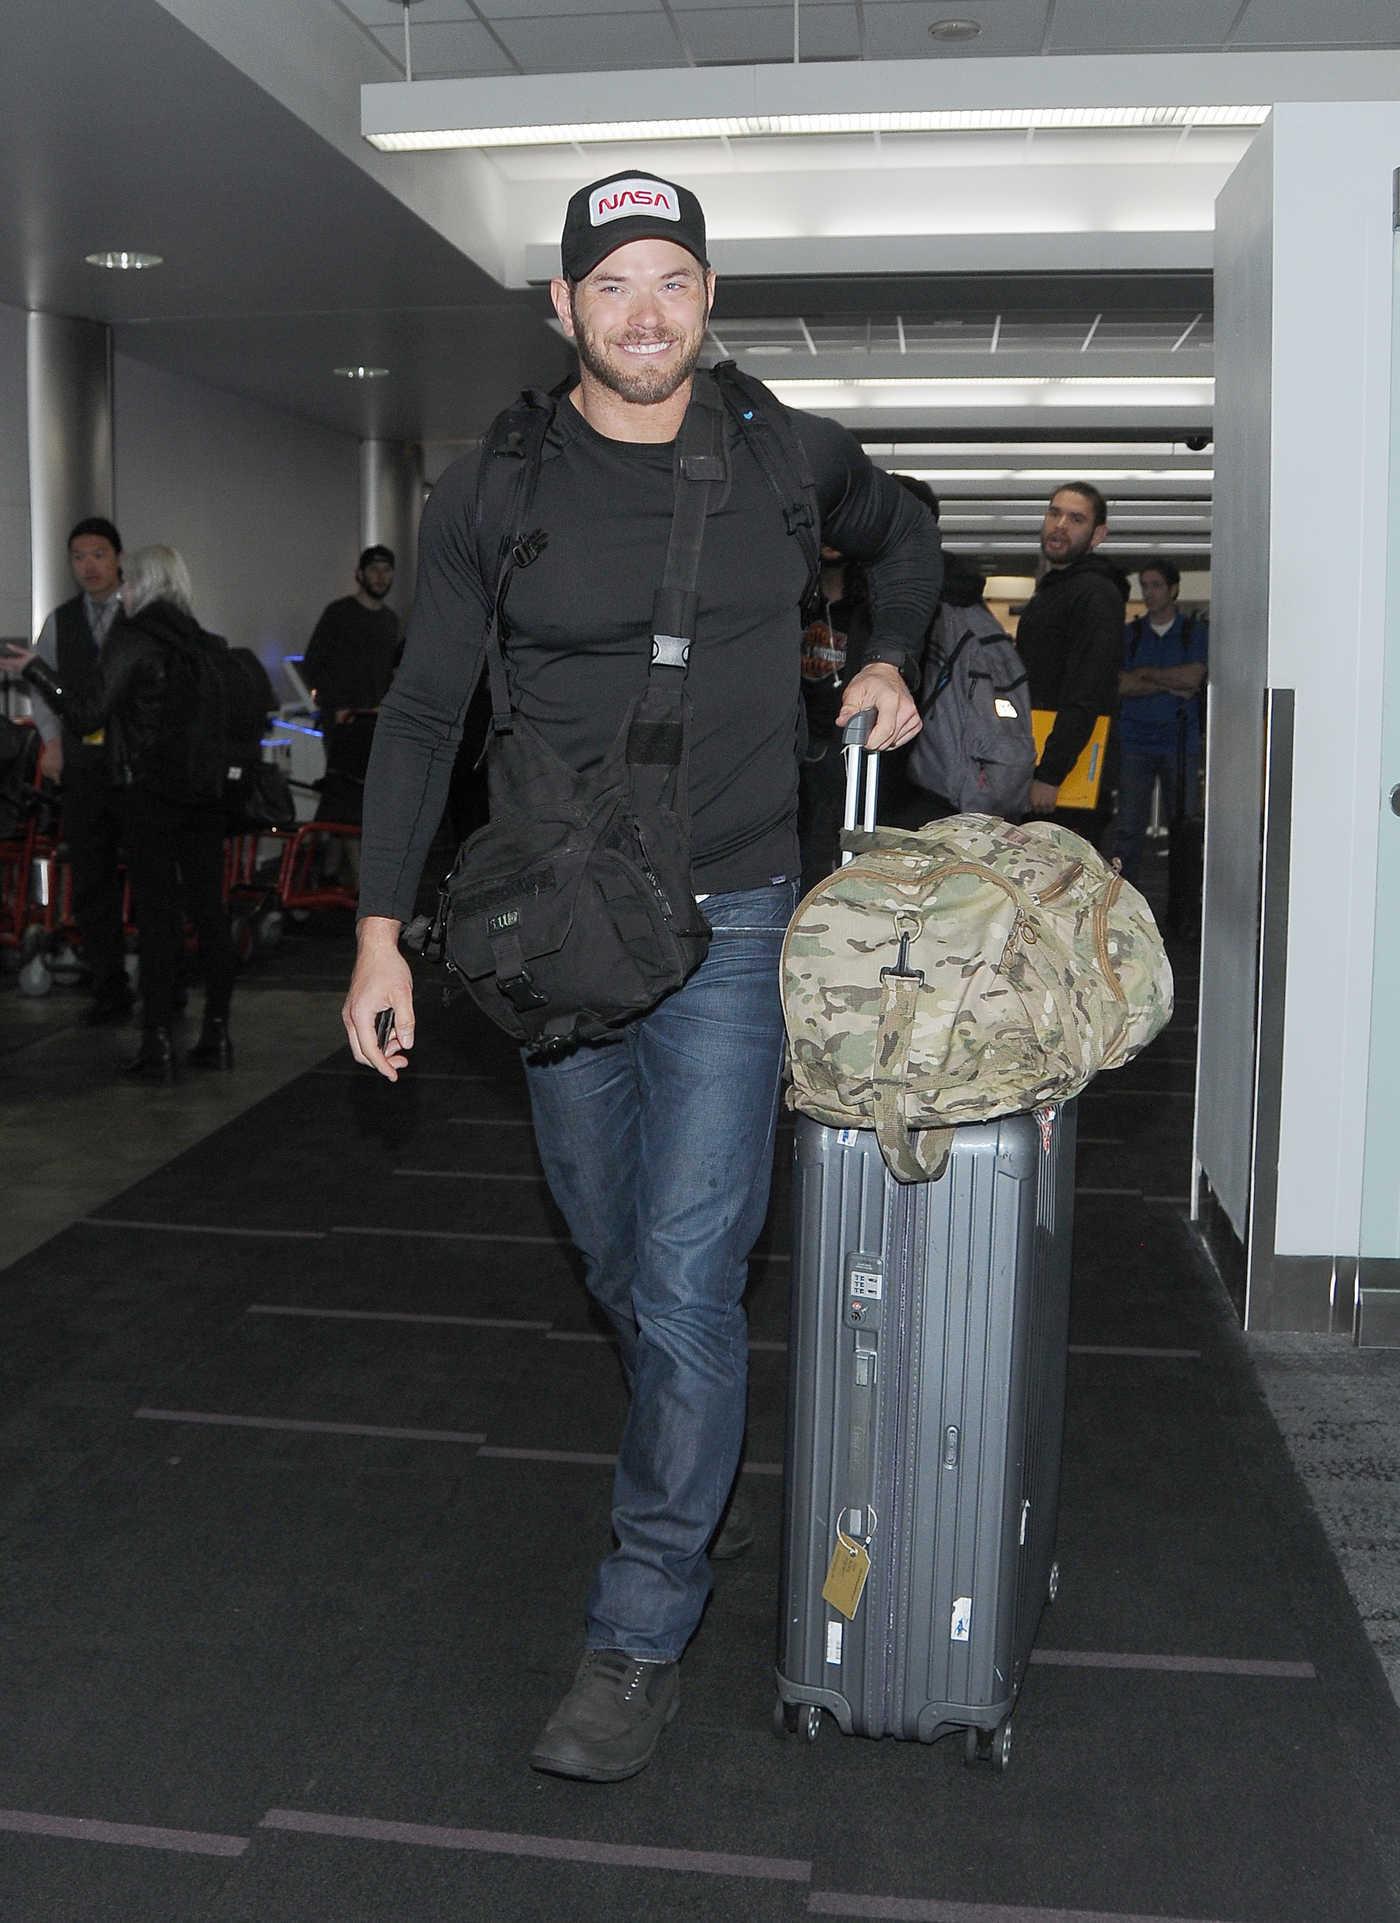 Kellan Lutz in a Black Cap Arrives at LAX Airport in LA 02/14/2019